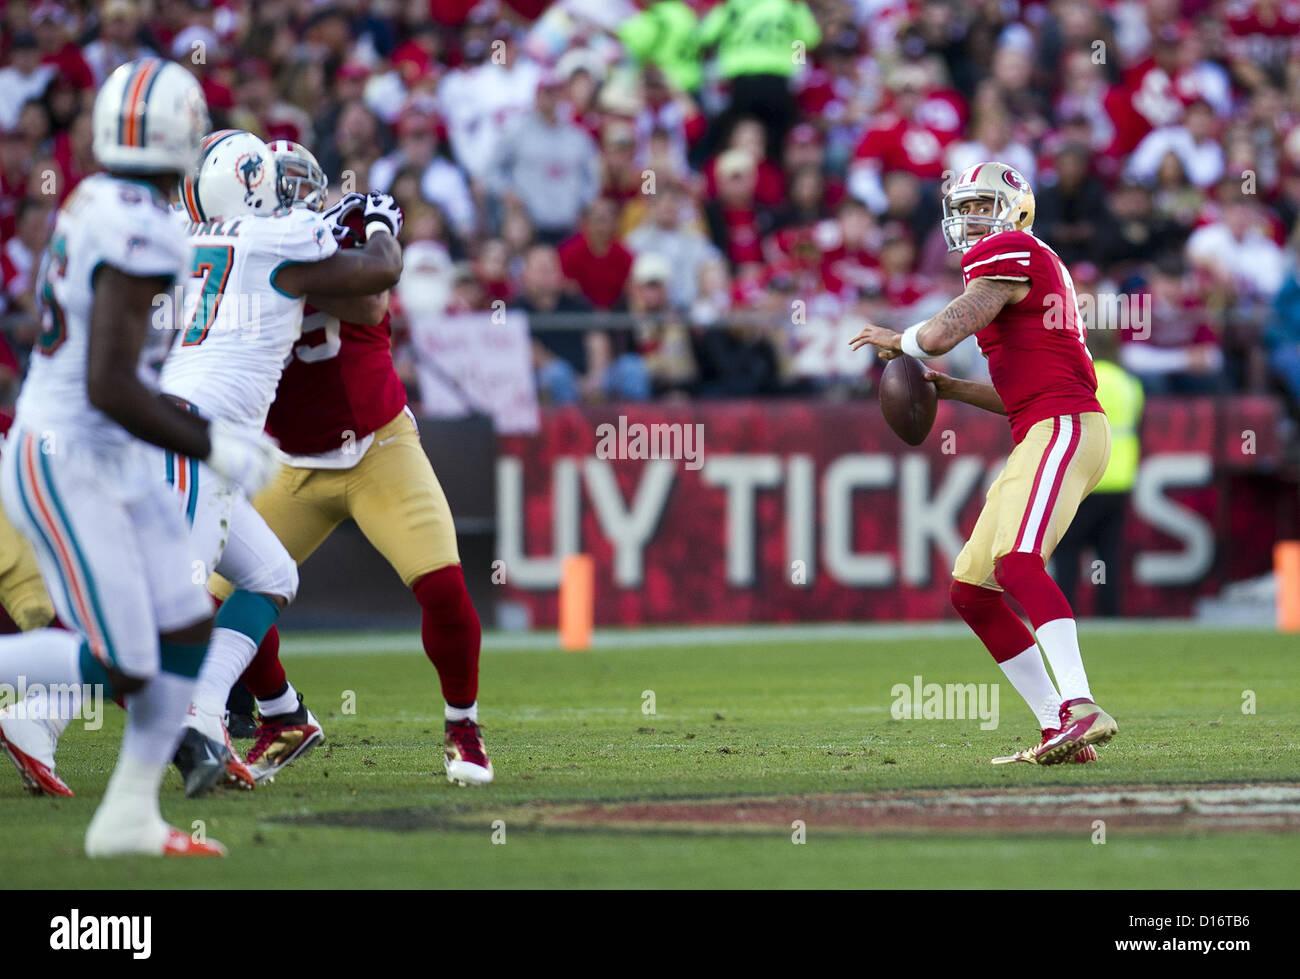 Dec. 9, 2012 - San Francisco, CA, USA - San Francisco 49ers quarterback Colin Kaepernick (7) throws pass to San - Stock Image